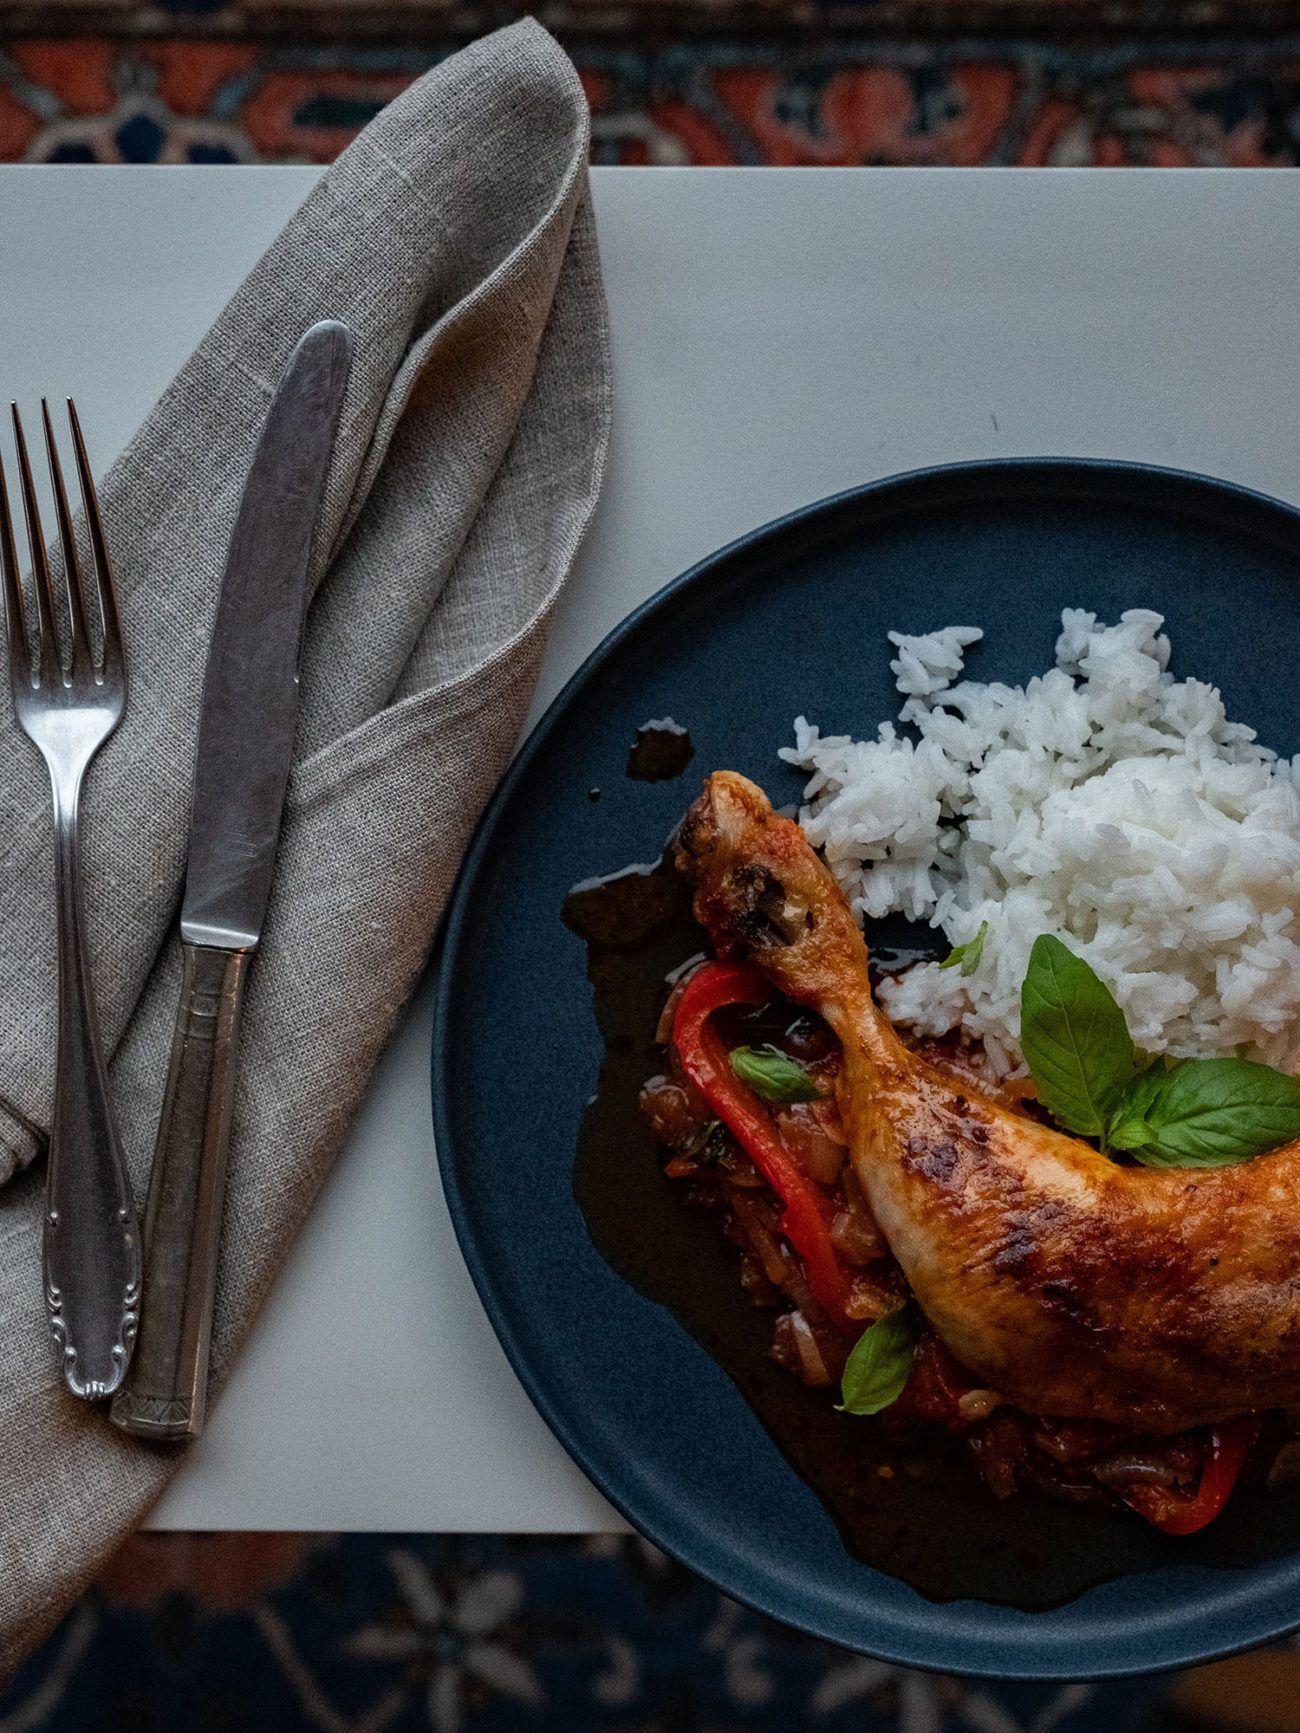 Rezept Hühnchenschenkel in Tomaten Paprika Soße, Besteck, Teller, Serviette